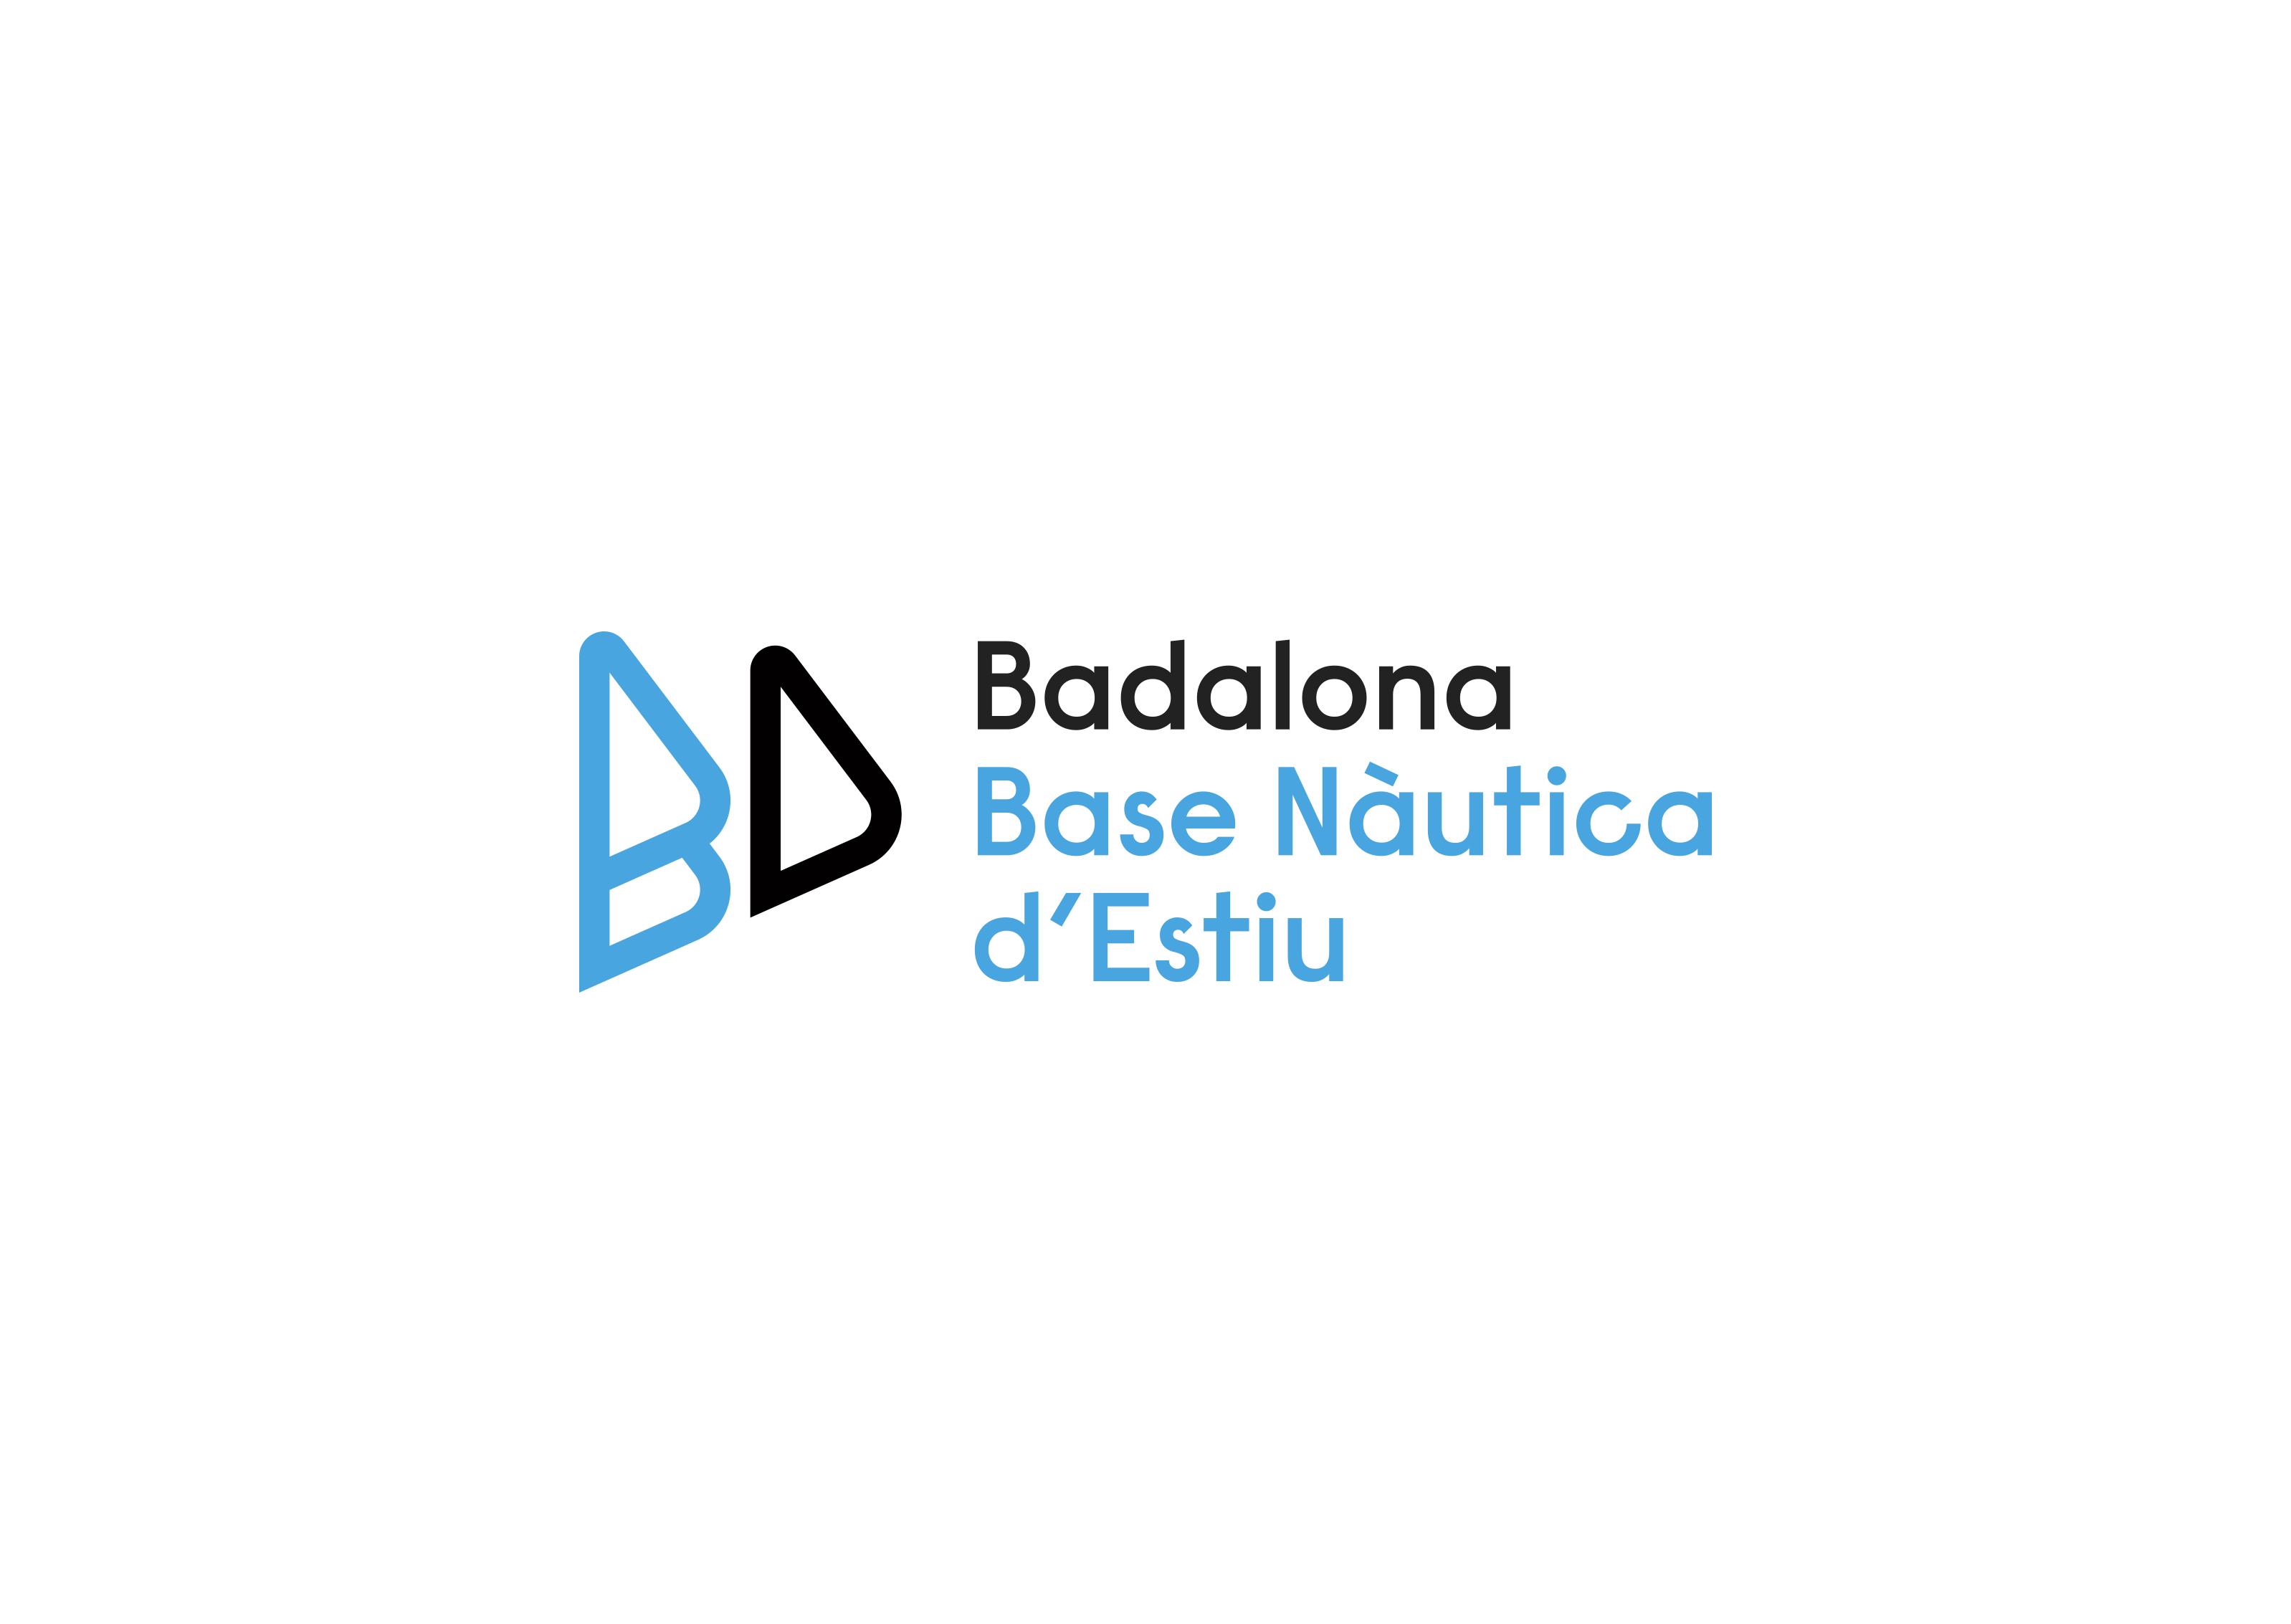 BaseNauticaEstiu_badalona_8.jpg